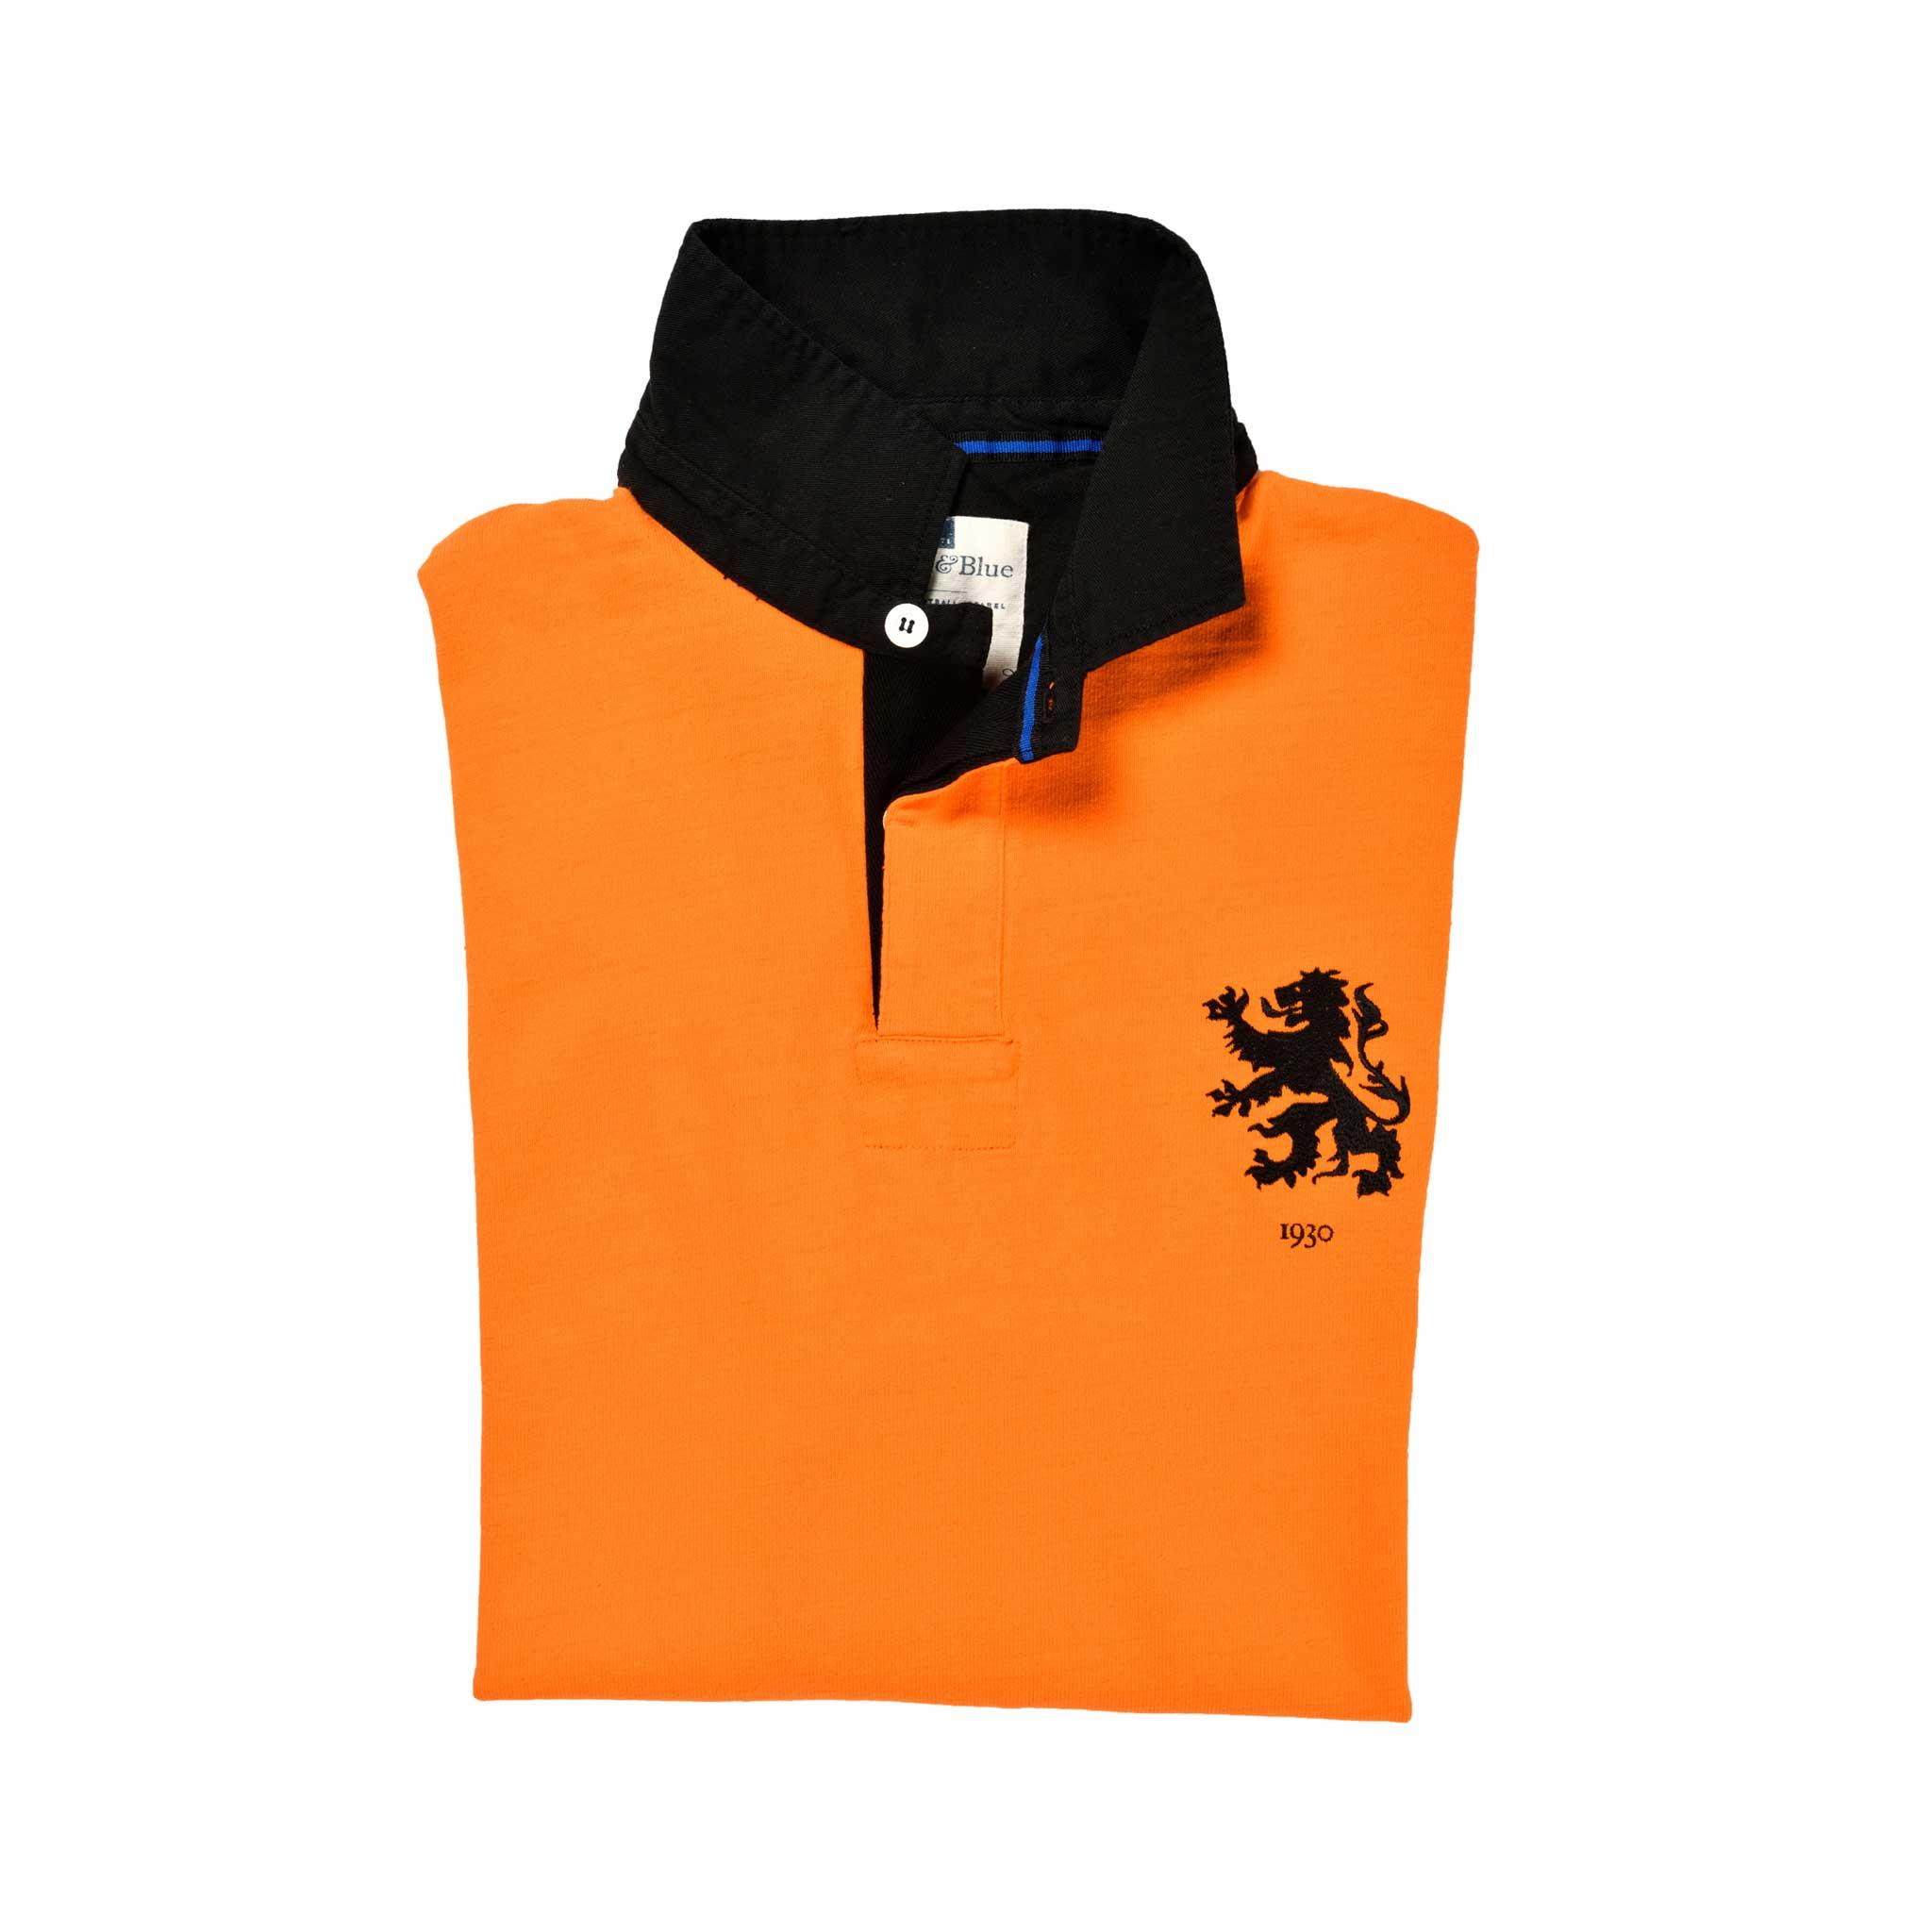 Netherlands 1930 Rugby Shirt_Folded